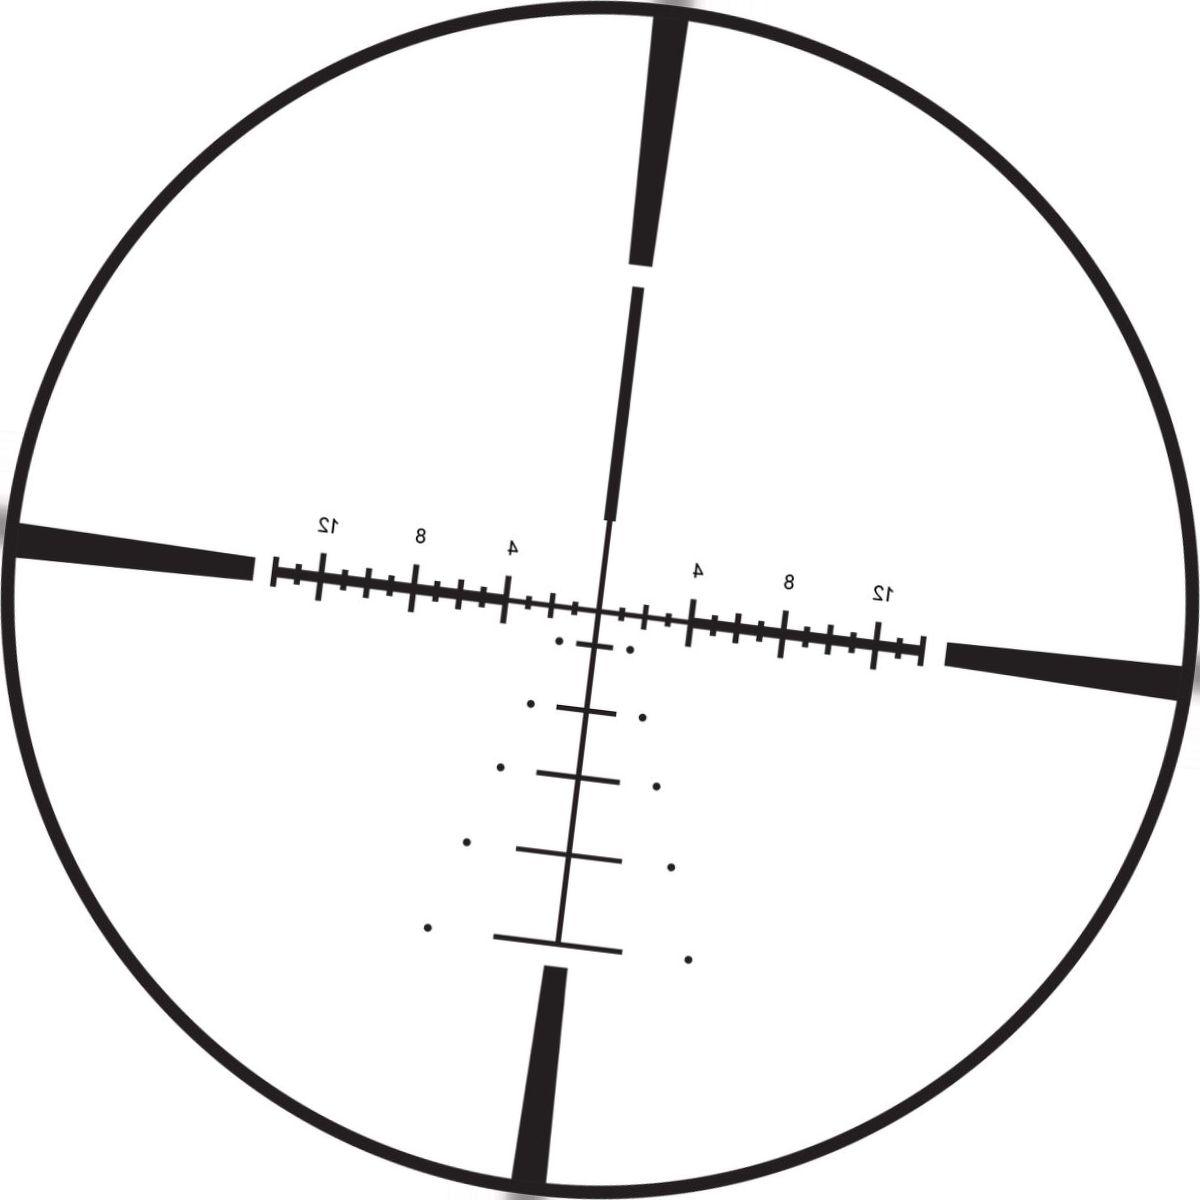 Burris Veracity 30mm FFP Riflescope with M.A.D. Knob System